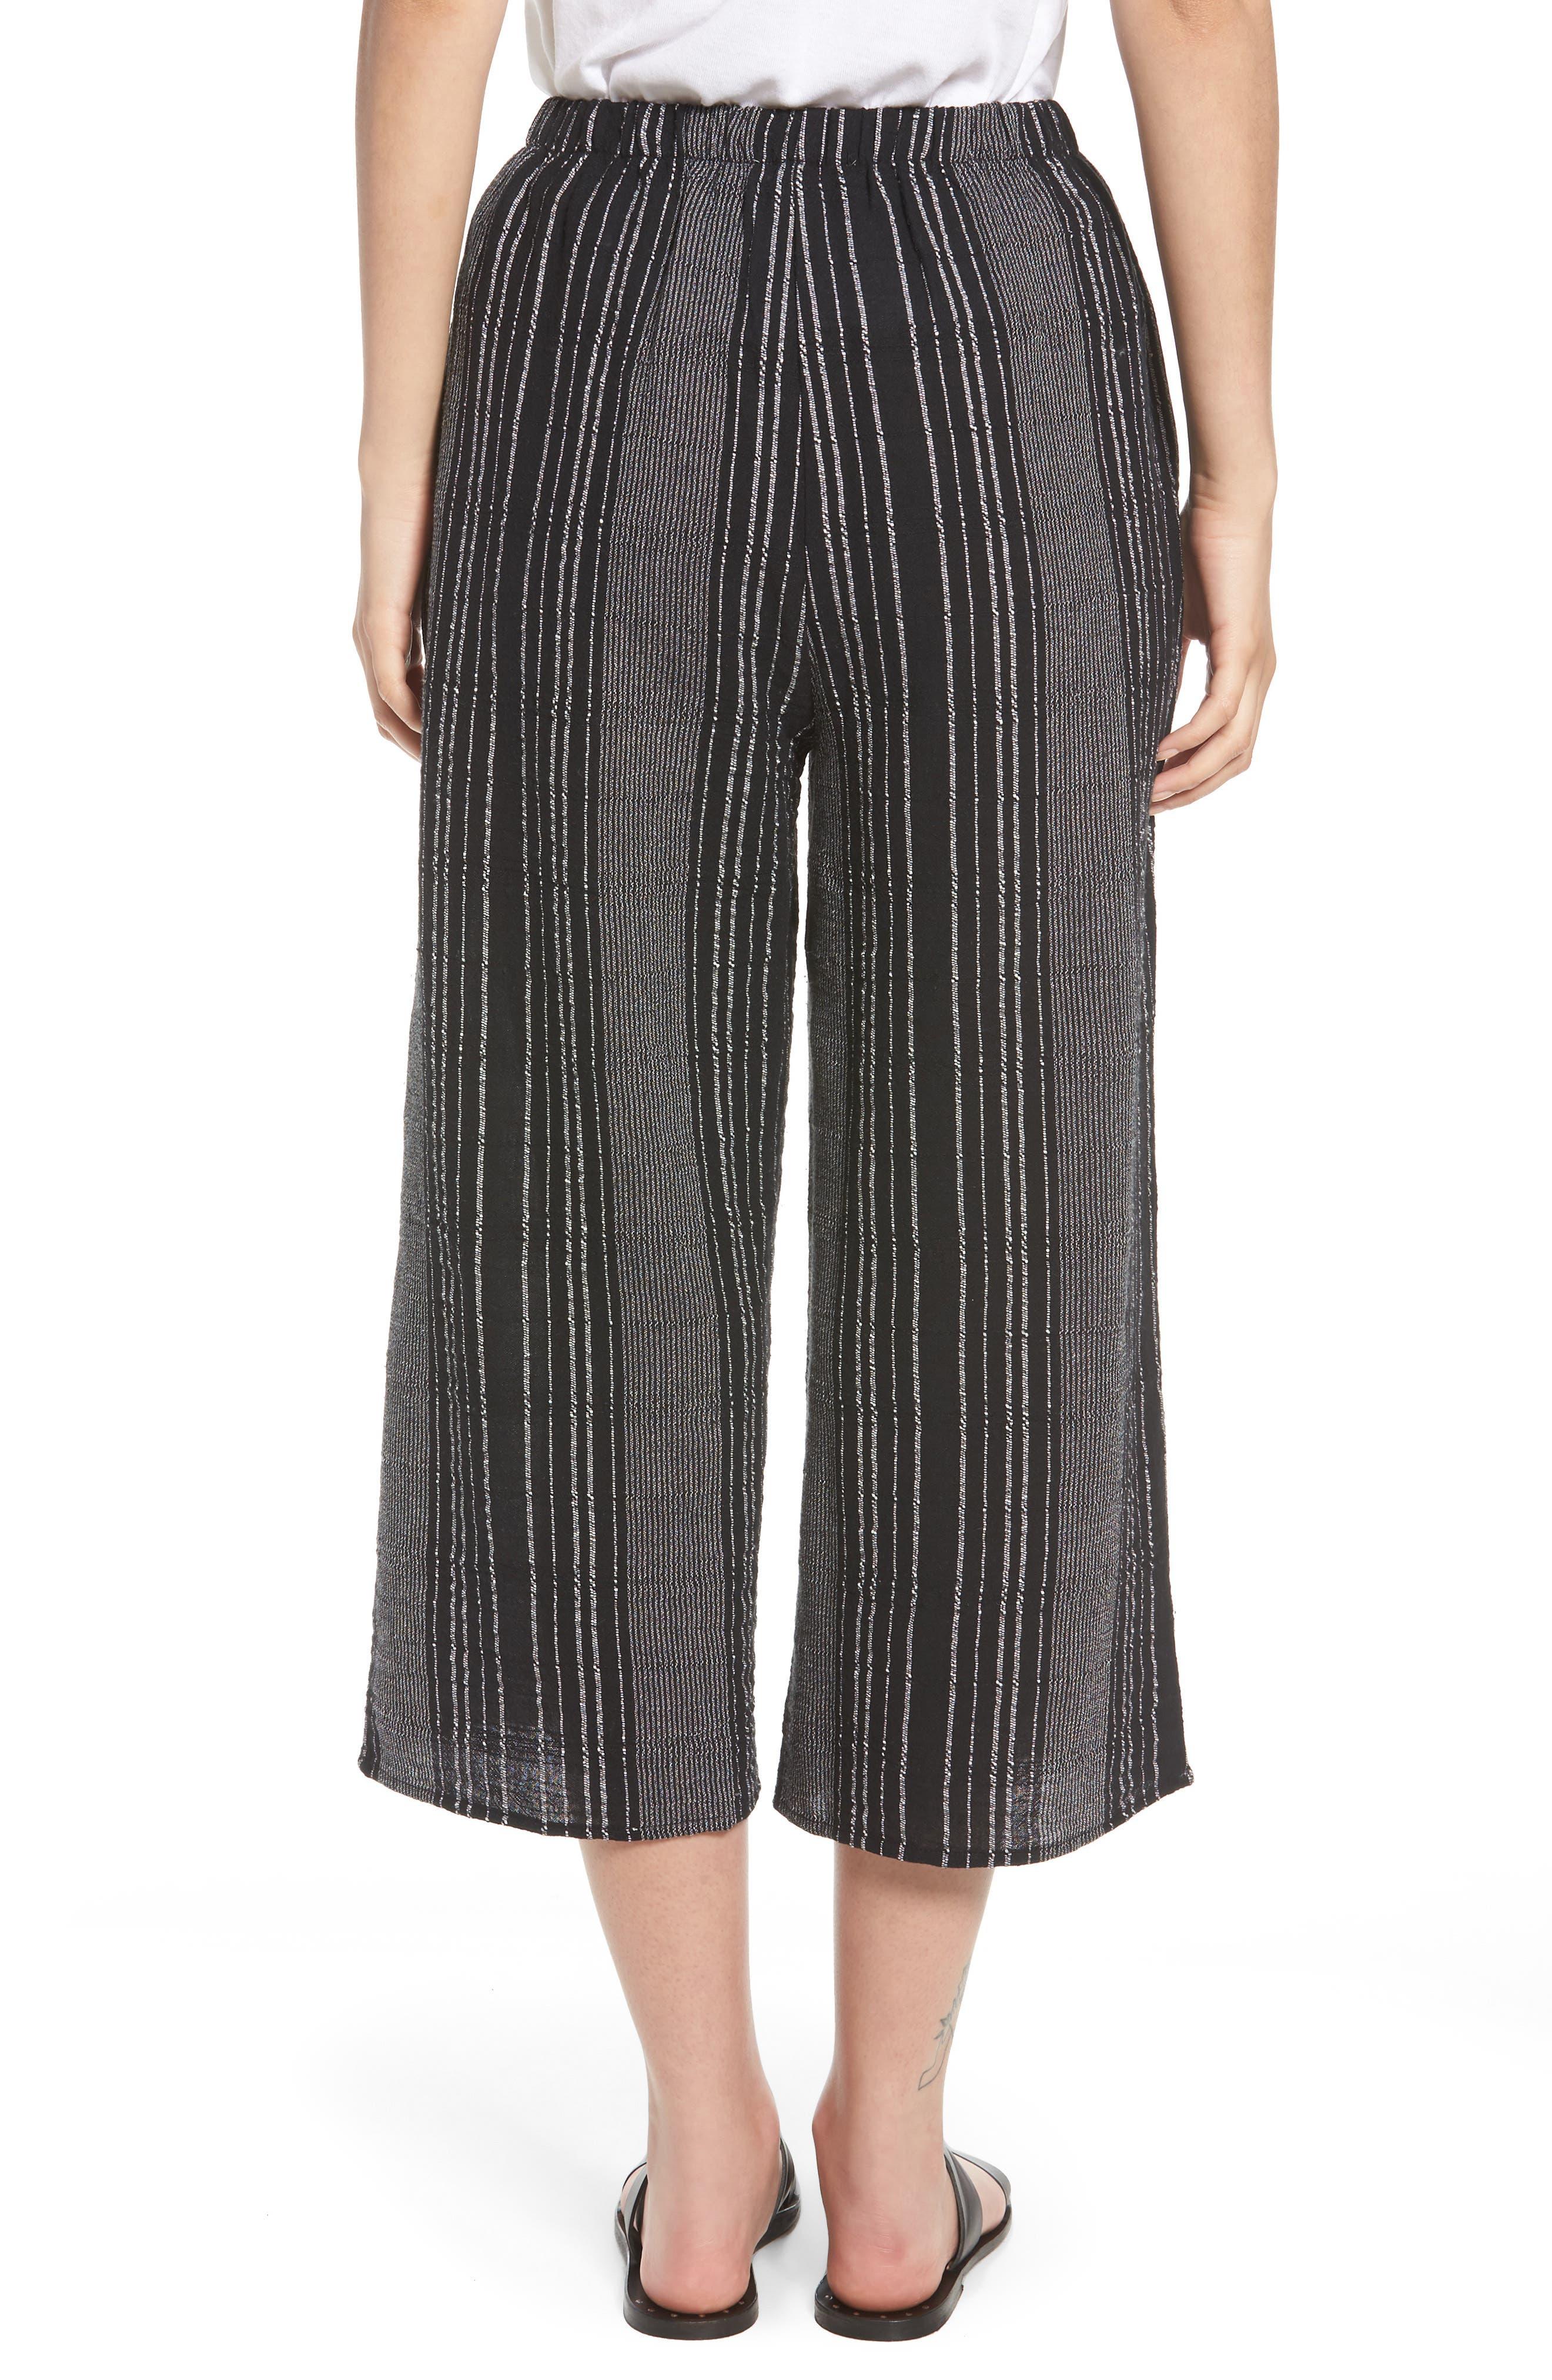 Bella Stripe Crop Pants,                             Alternate thumbnail 3, color,                             Black